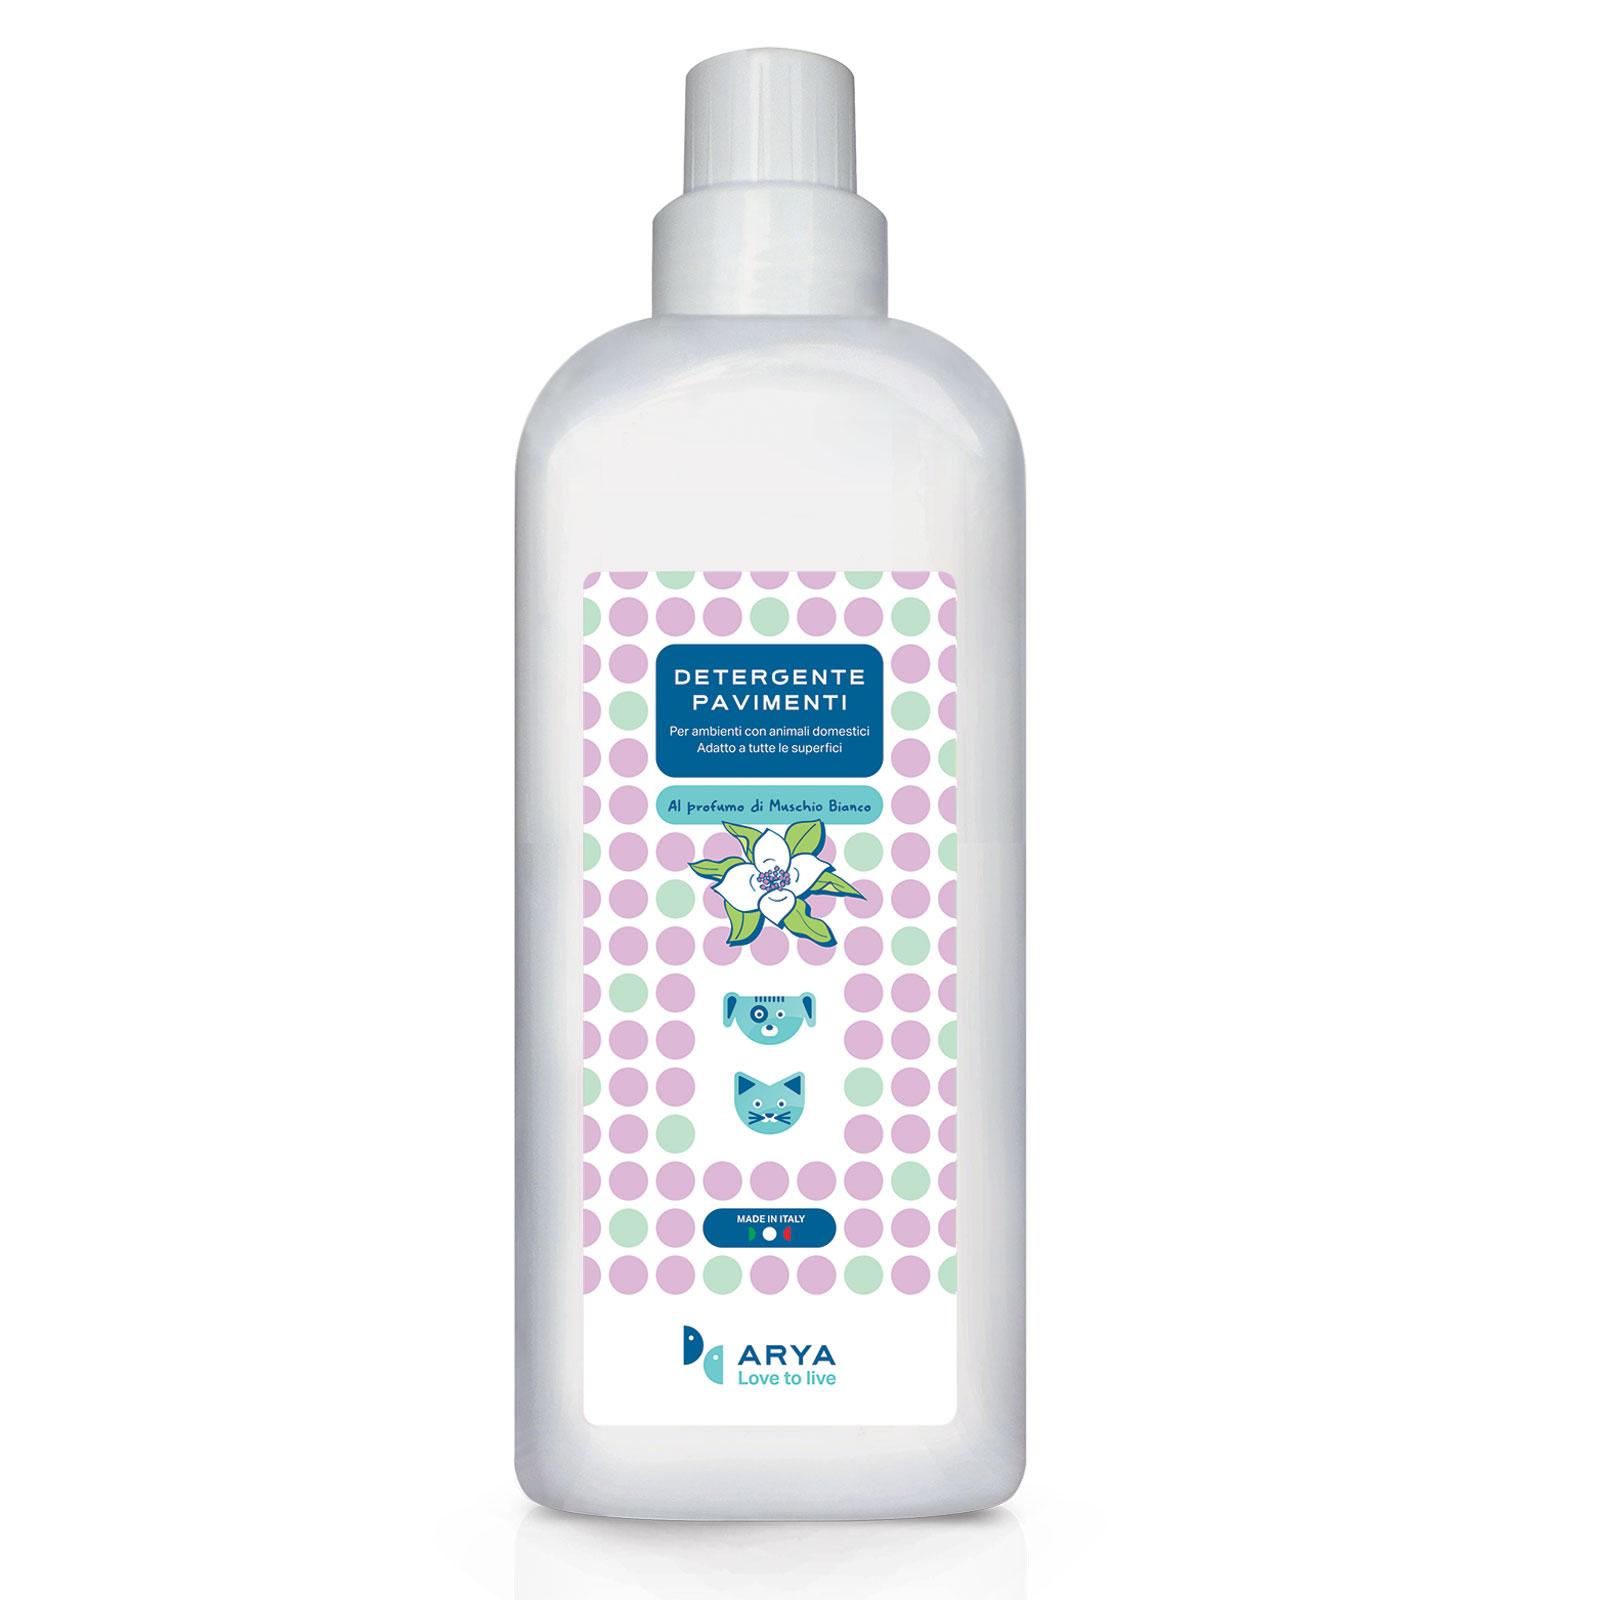 Detergente Pavimenti Muschio Bianco